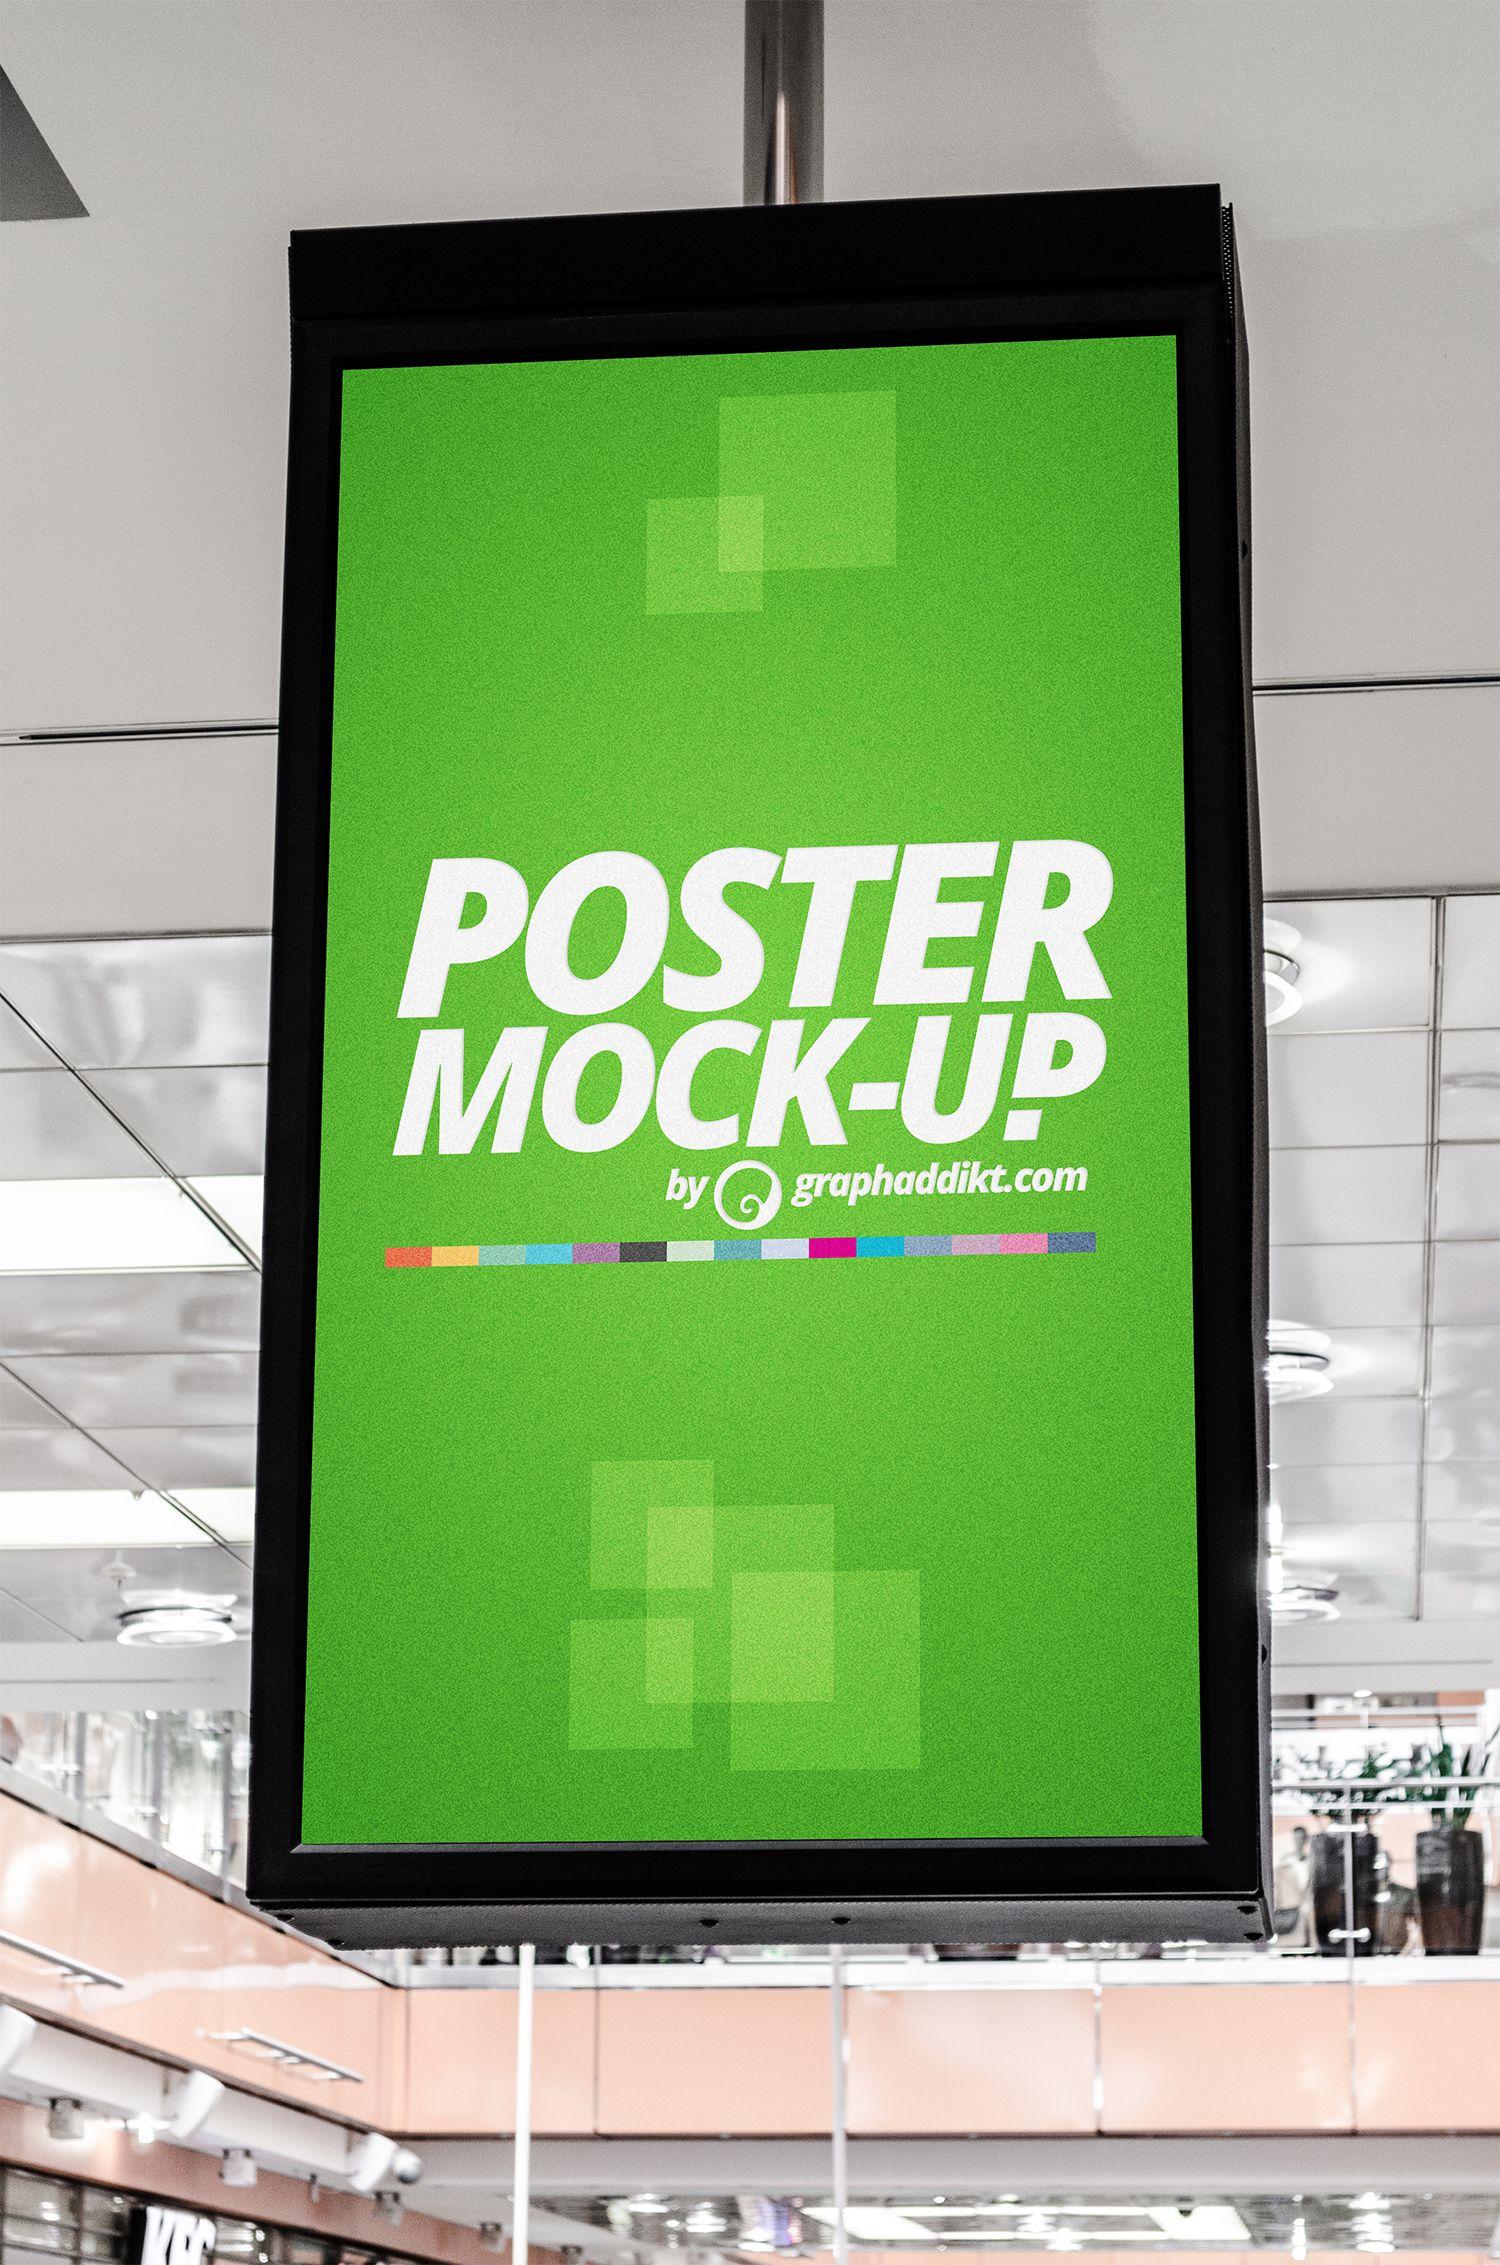 Free Indoor Advertising City Light Mockup Freemockup Mockup